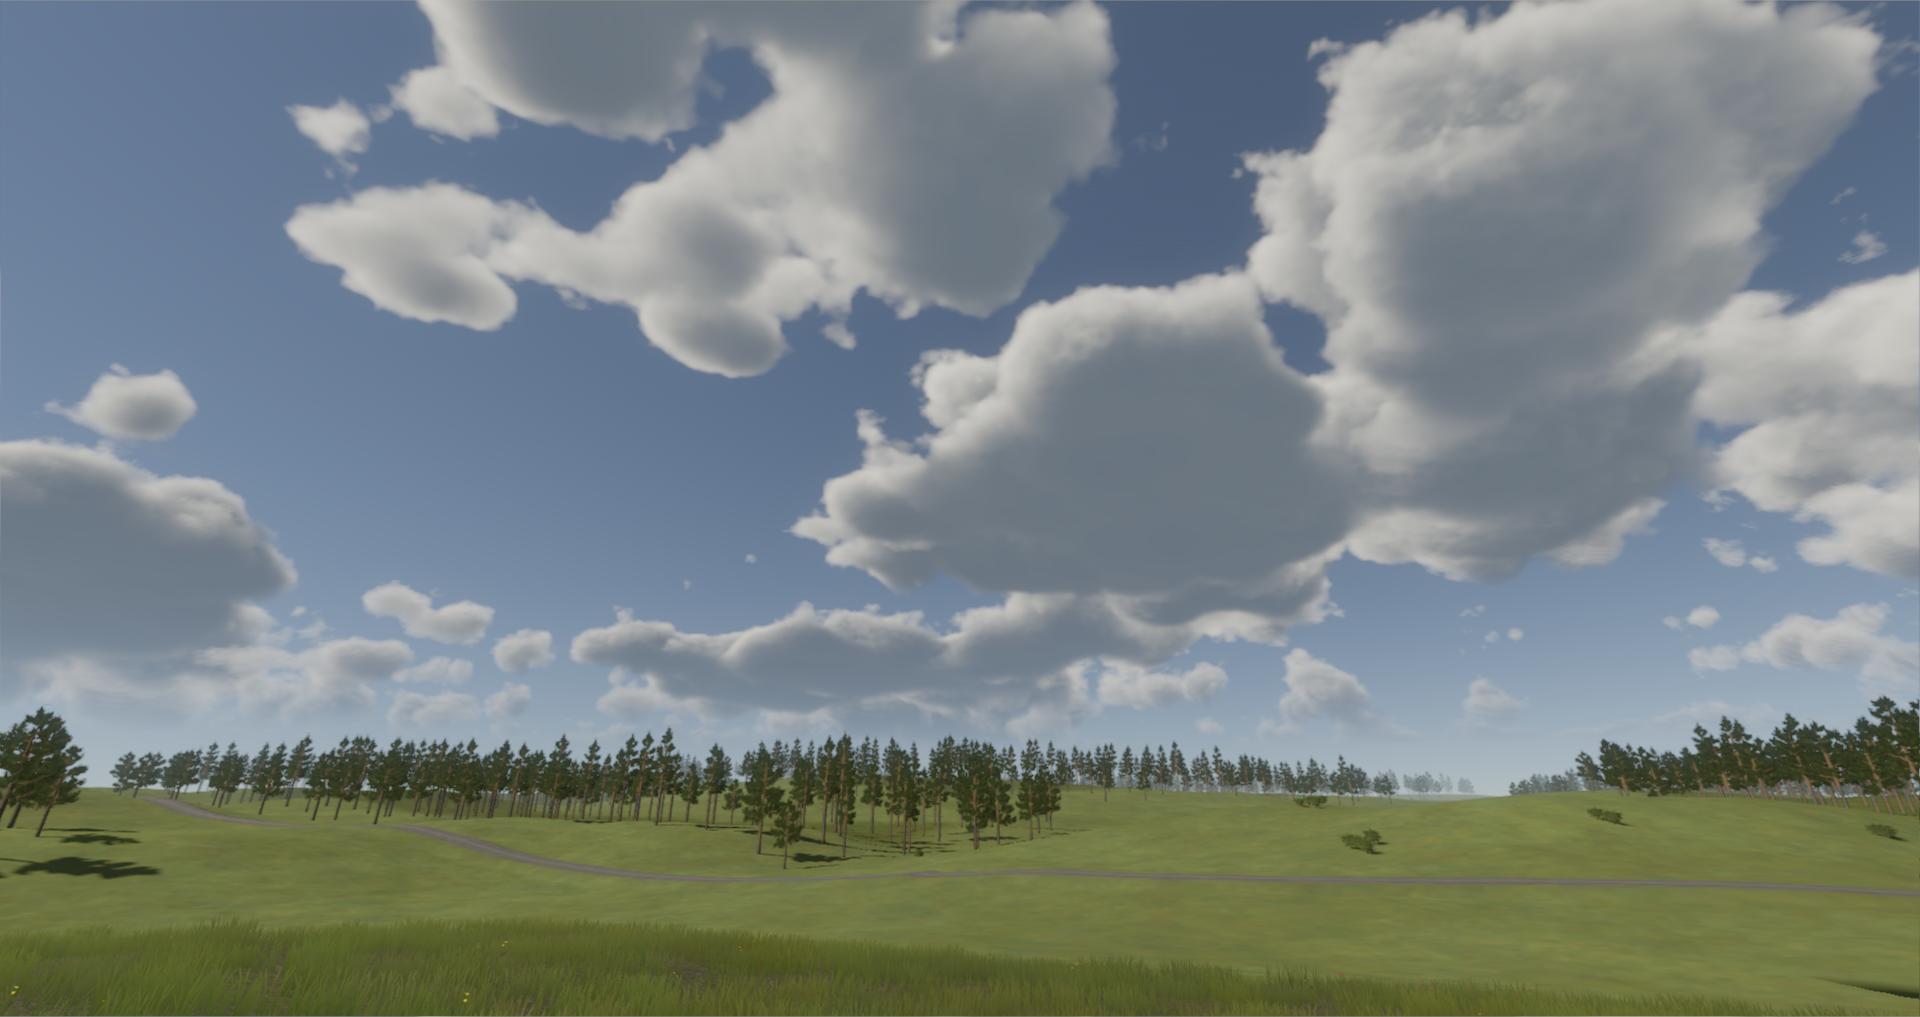 Volumetric Clouds 2 image - Afterconflict Lost War - Indie DB